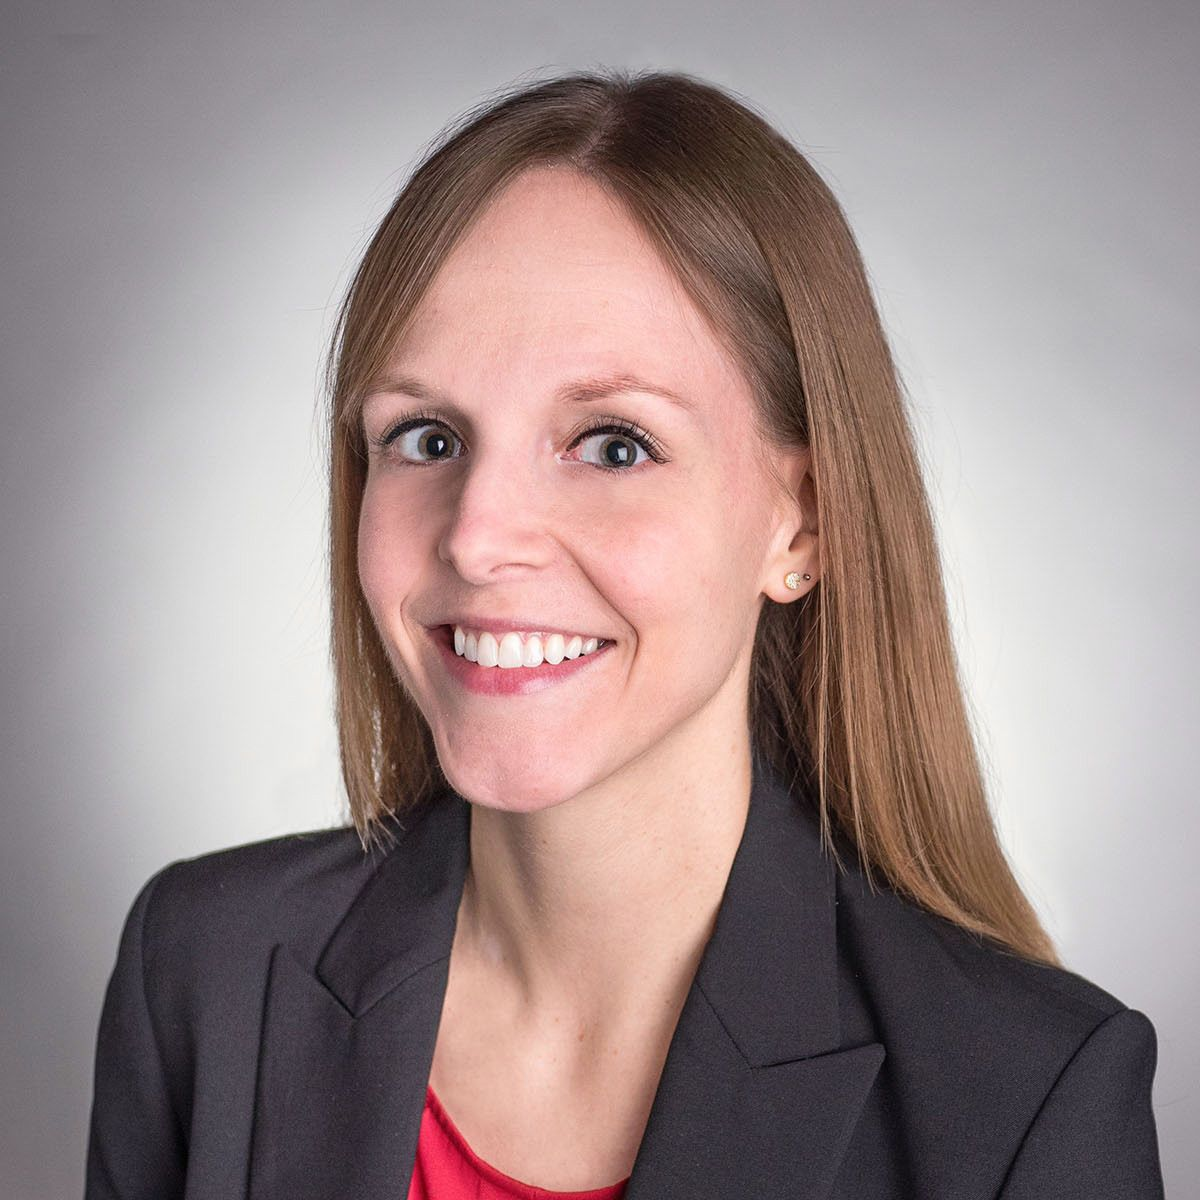 Jenny Olsen